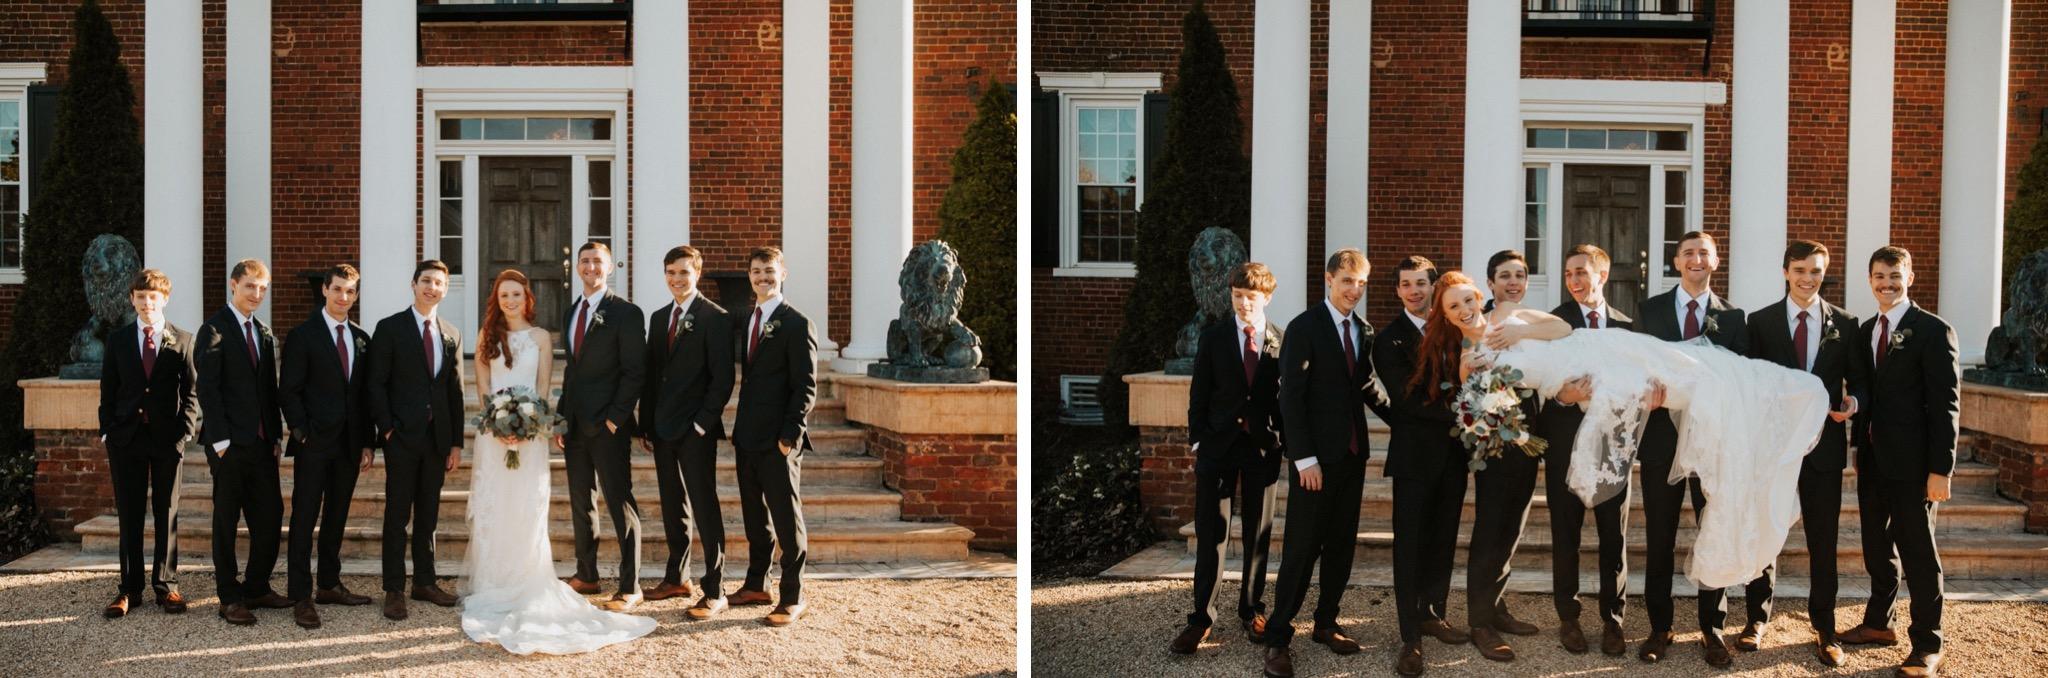 57_West Manor Estate Weddings - Pat Cori Photography-119_West Manor Estate Weddings - Pat Cori Photography-120_groomsmen_VirginiaWeddingPhotographer_WestManorEstate_Portraits_Wedding.jpg